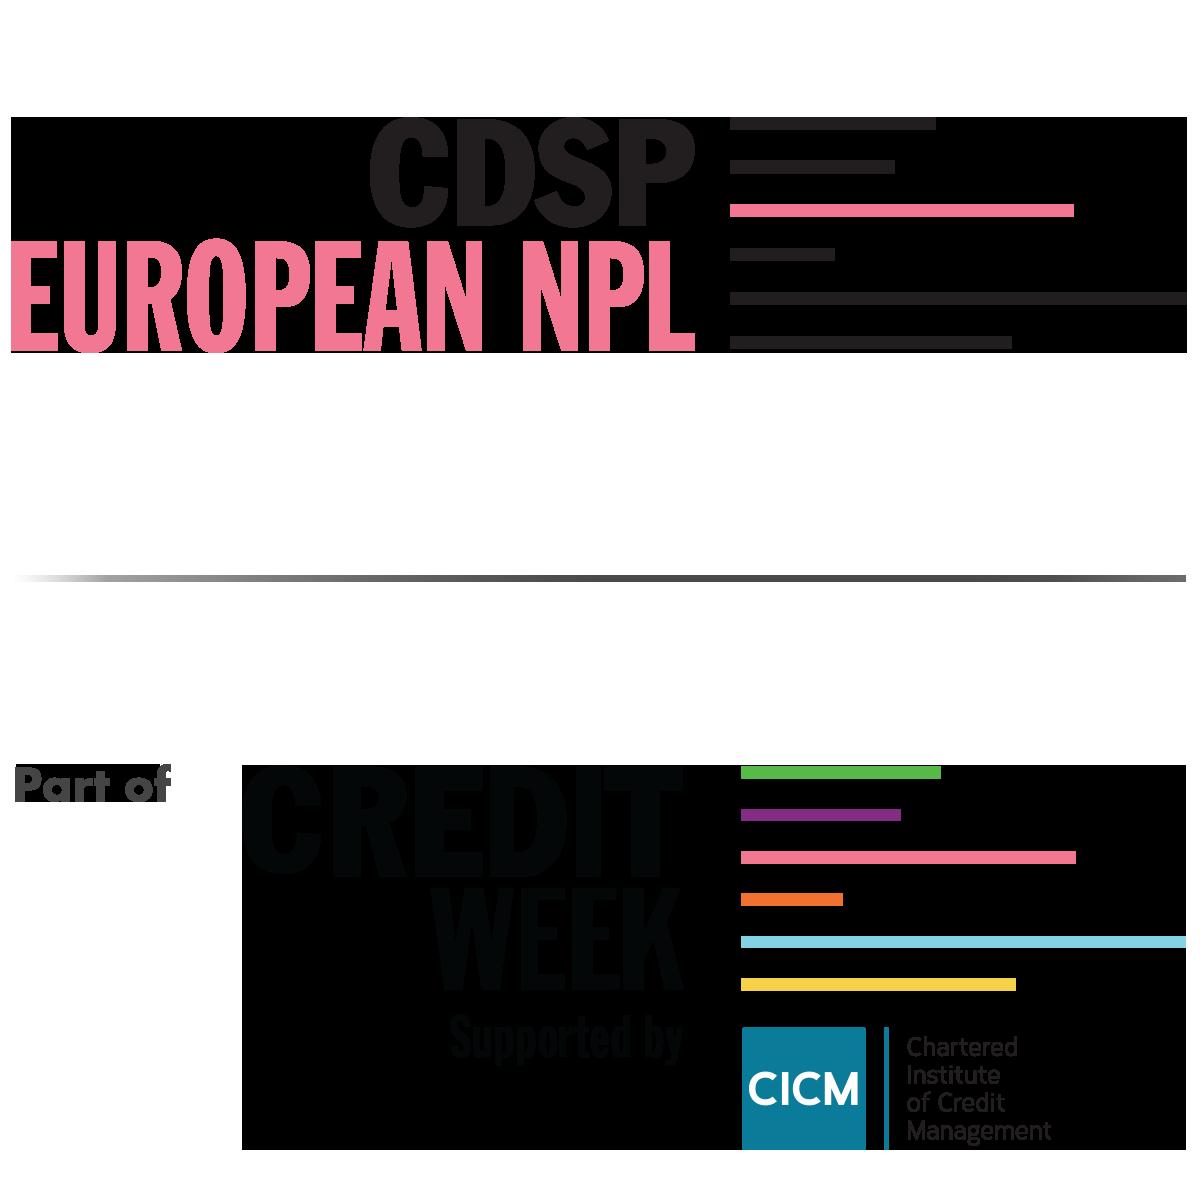 CW_CDSP_NPL.png